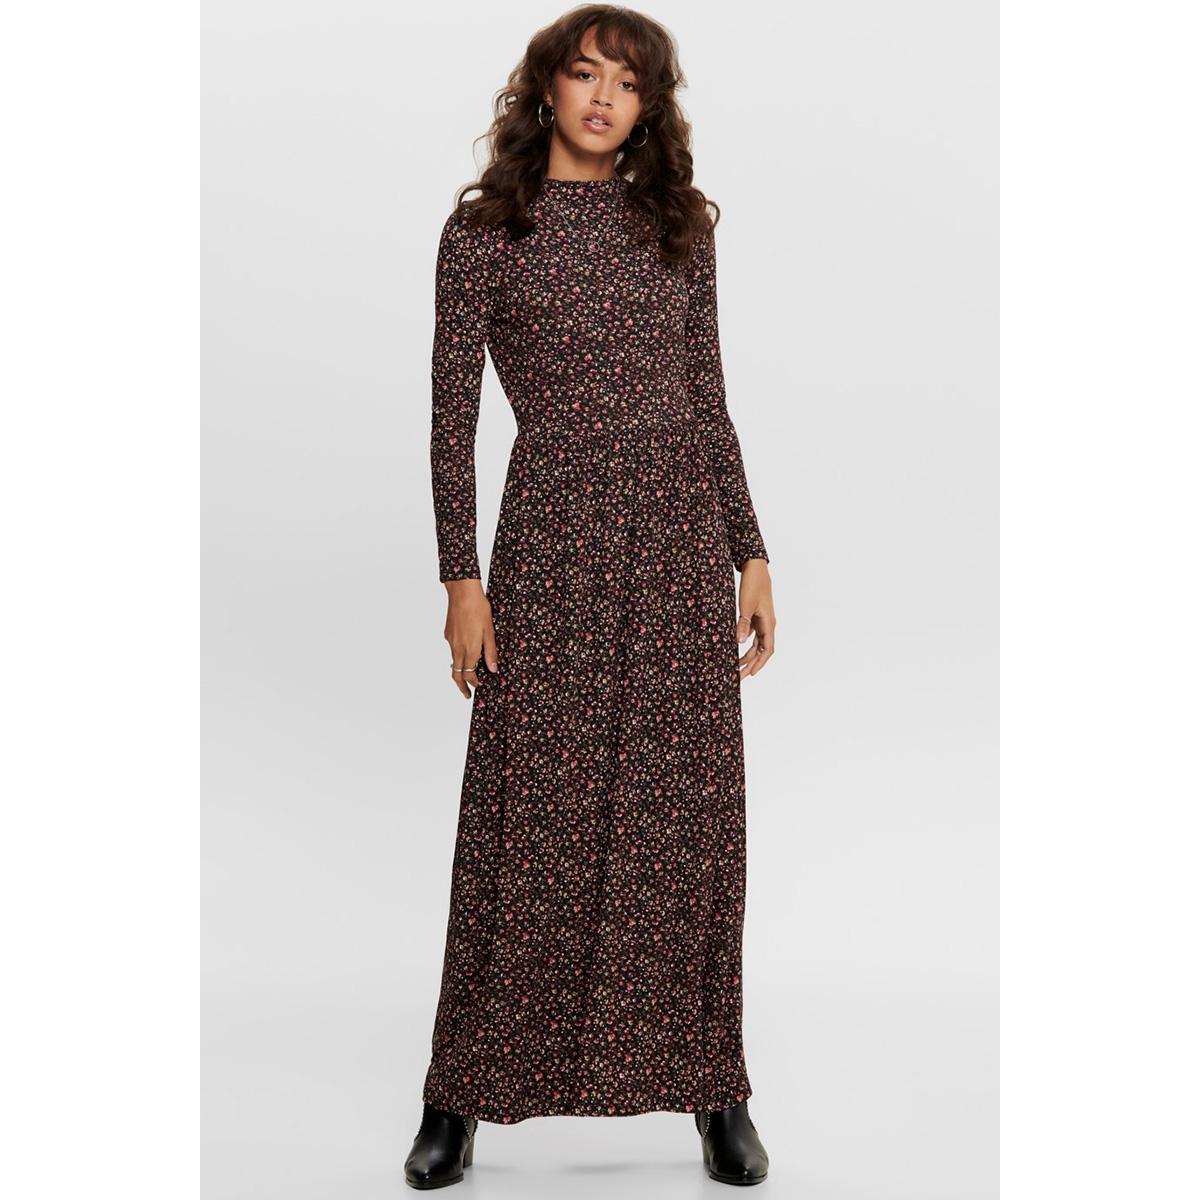 jdysvan l/s aop dress jrs rpt1 15202713 jacqueline de yong jurk black/svan